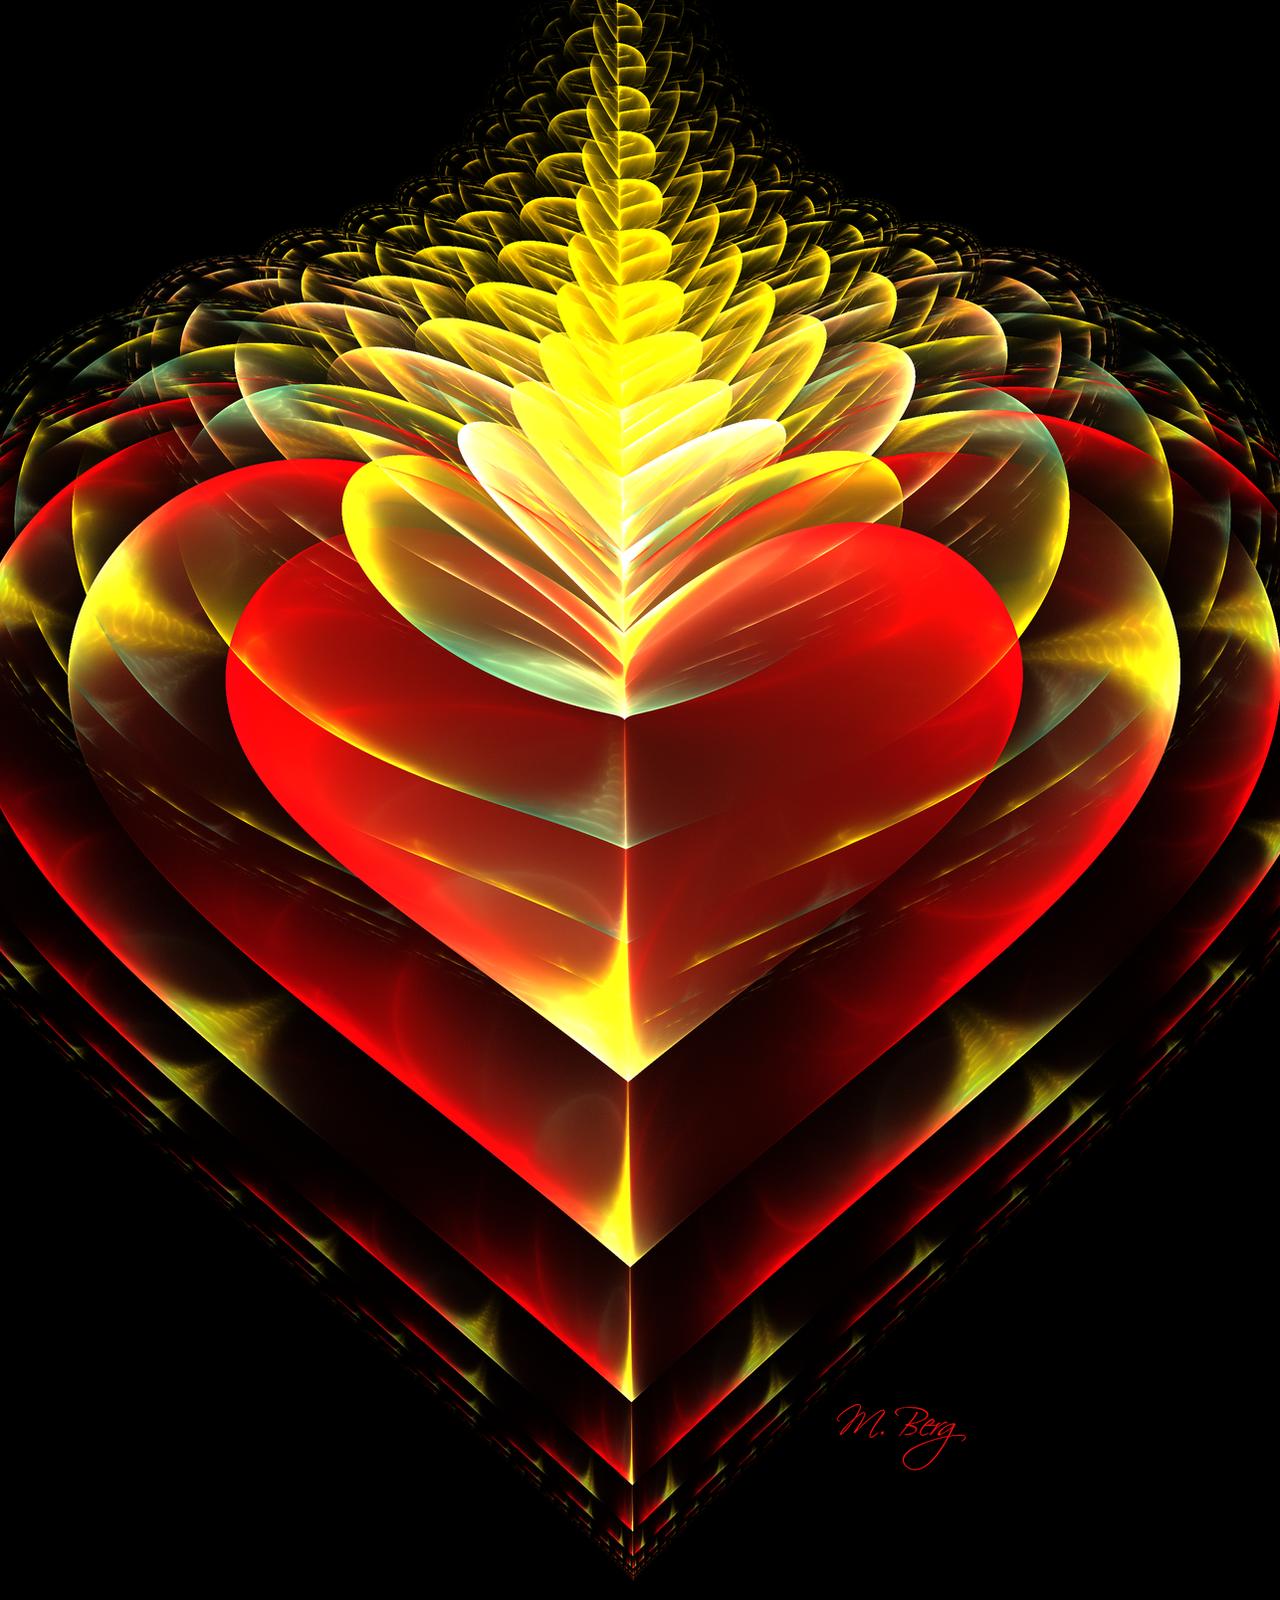 Gift ideas  Love_burns_eternal_by_myberg2-d53c3pr